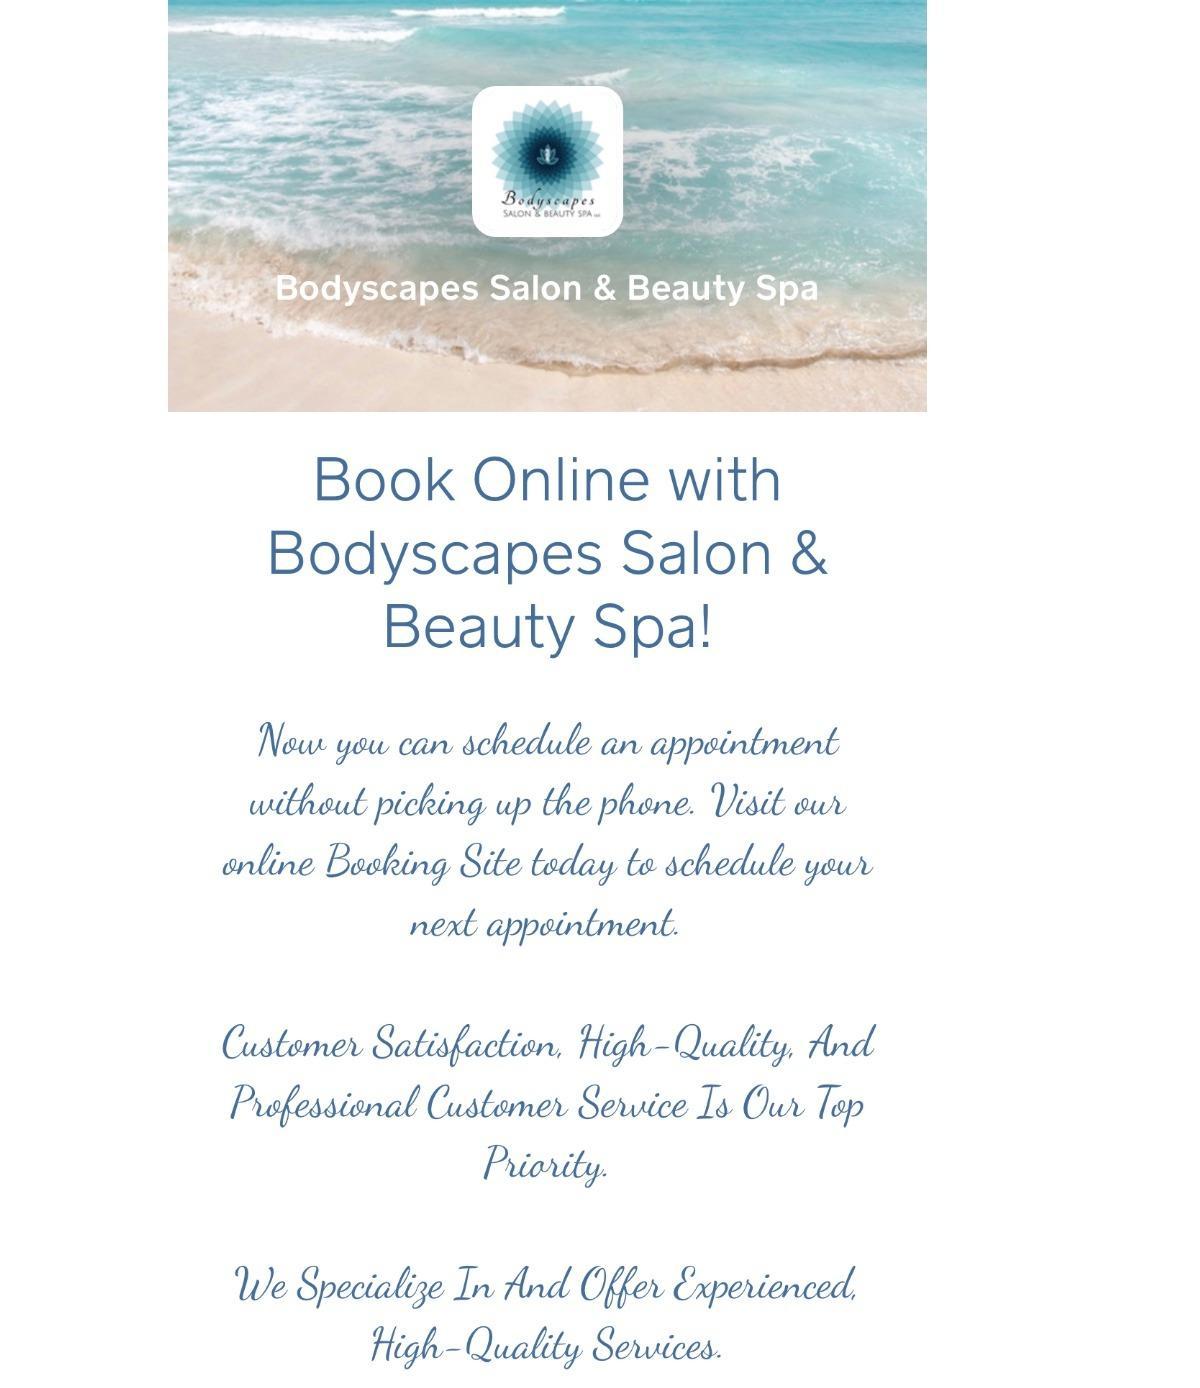 Bodyscapes Salon & Beauty Spa image 11